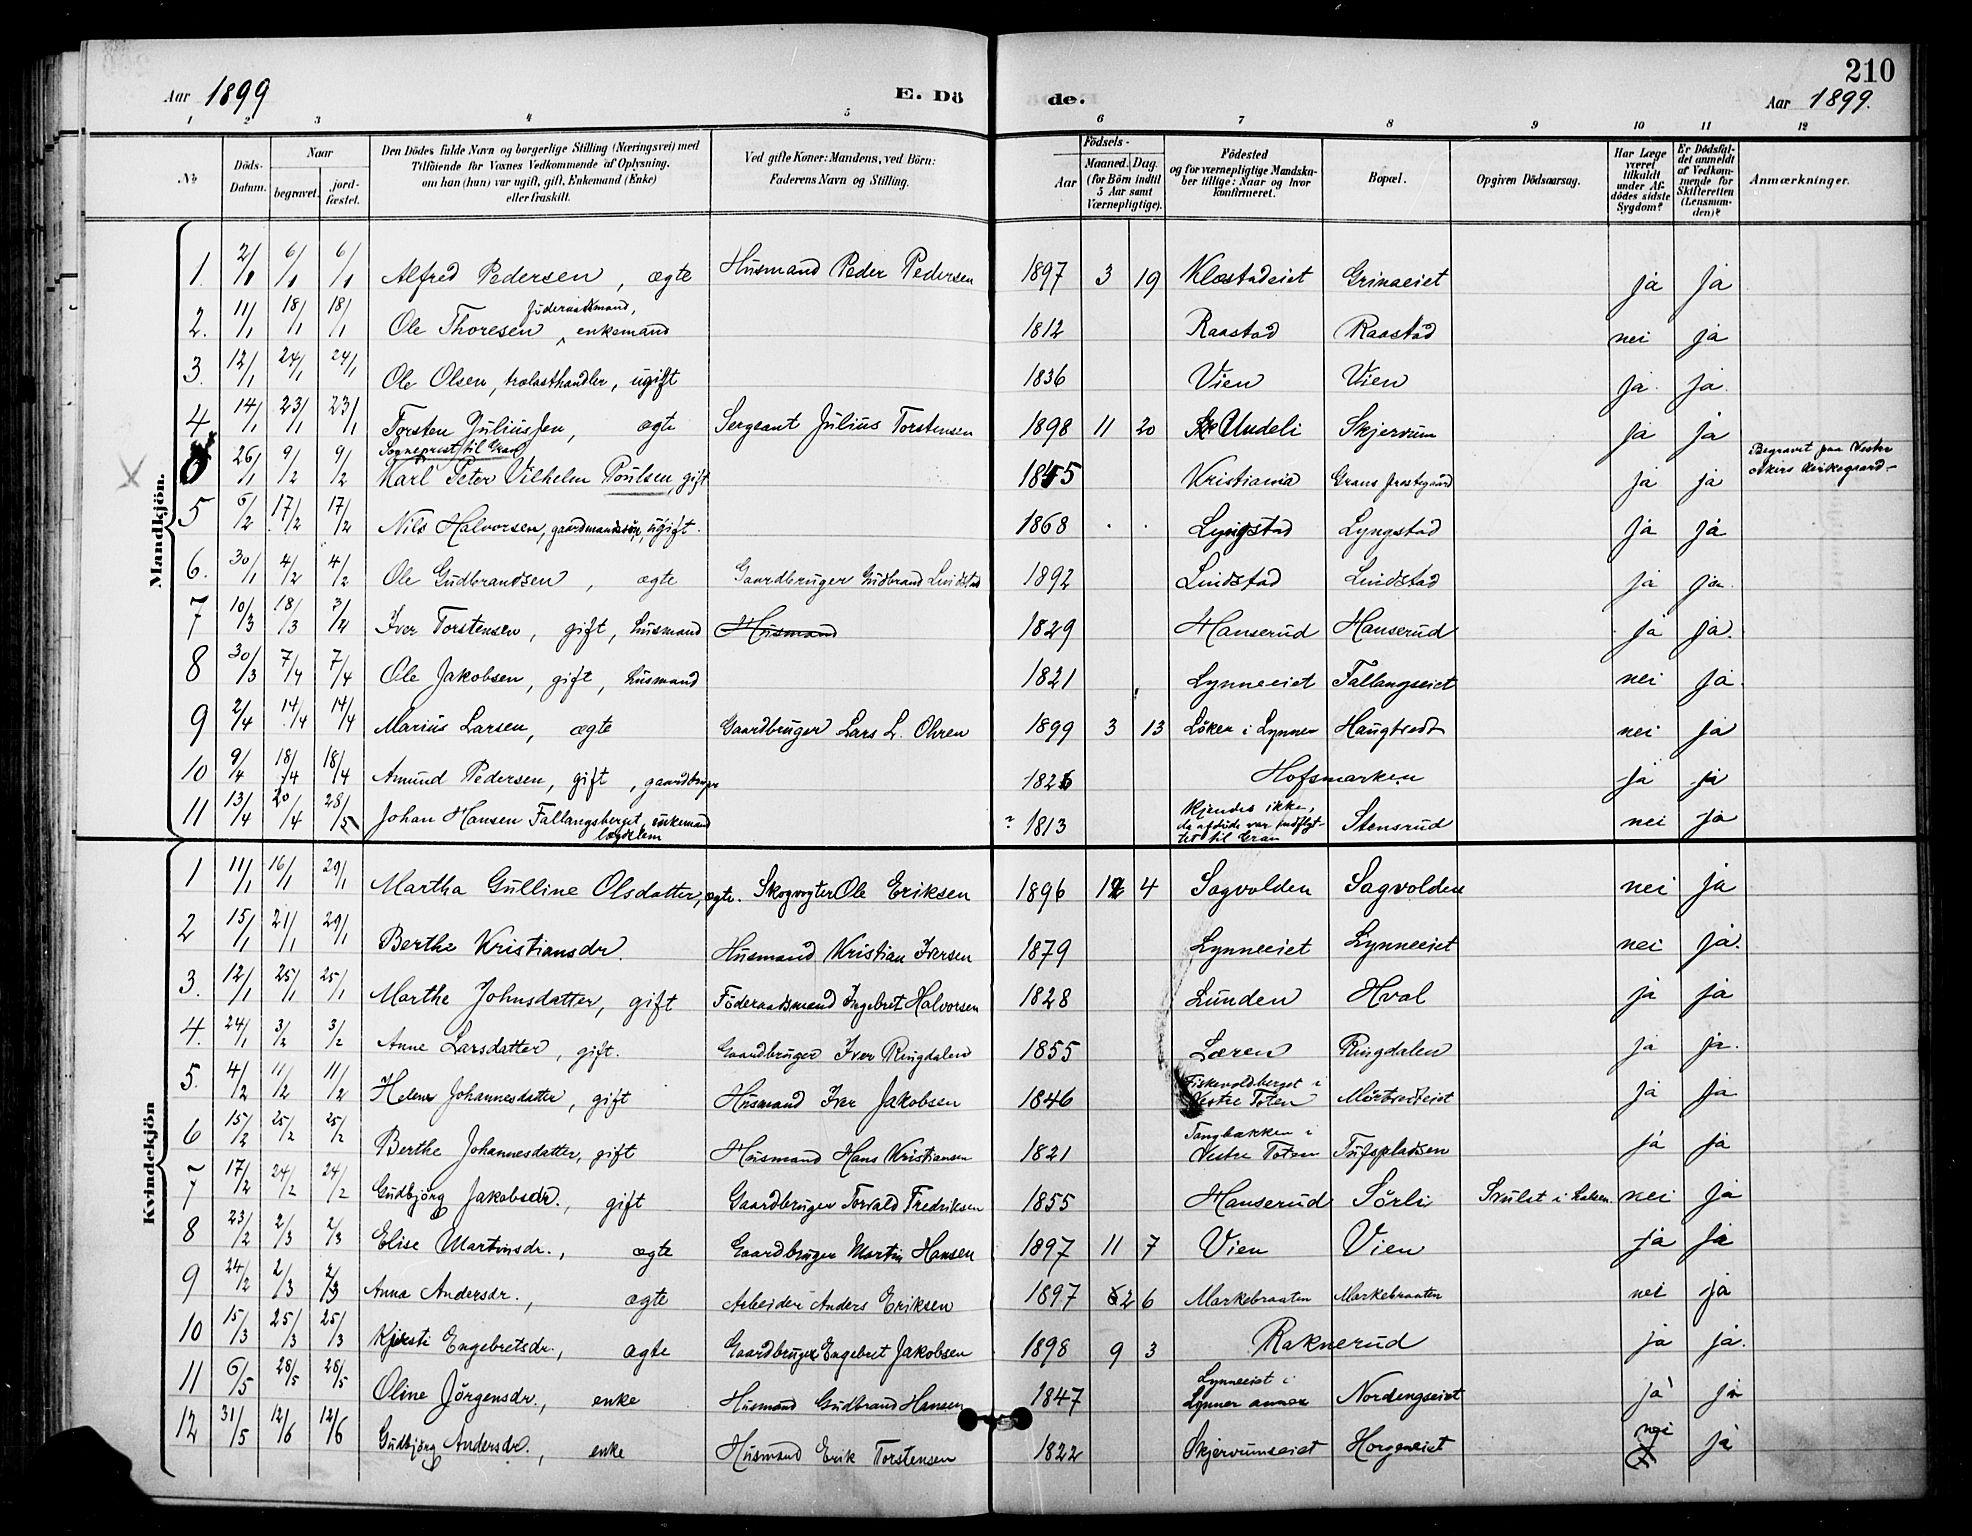 SAH, Gran prestekontor, Ministerialbok nr. 19, 1898-1907, s. 210